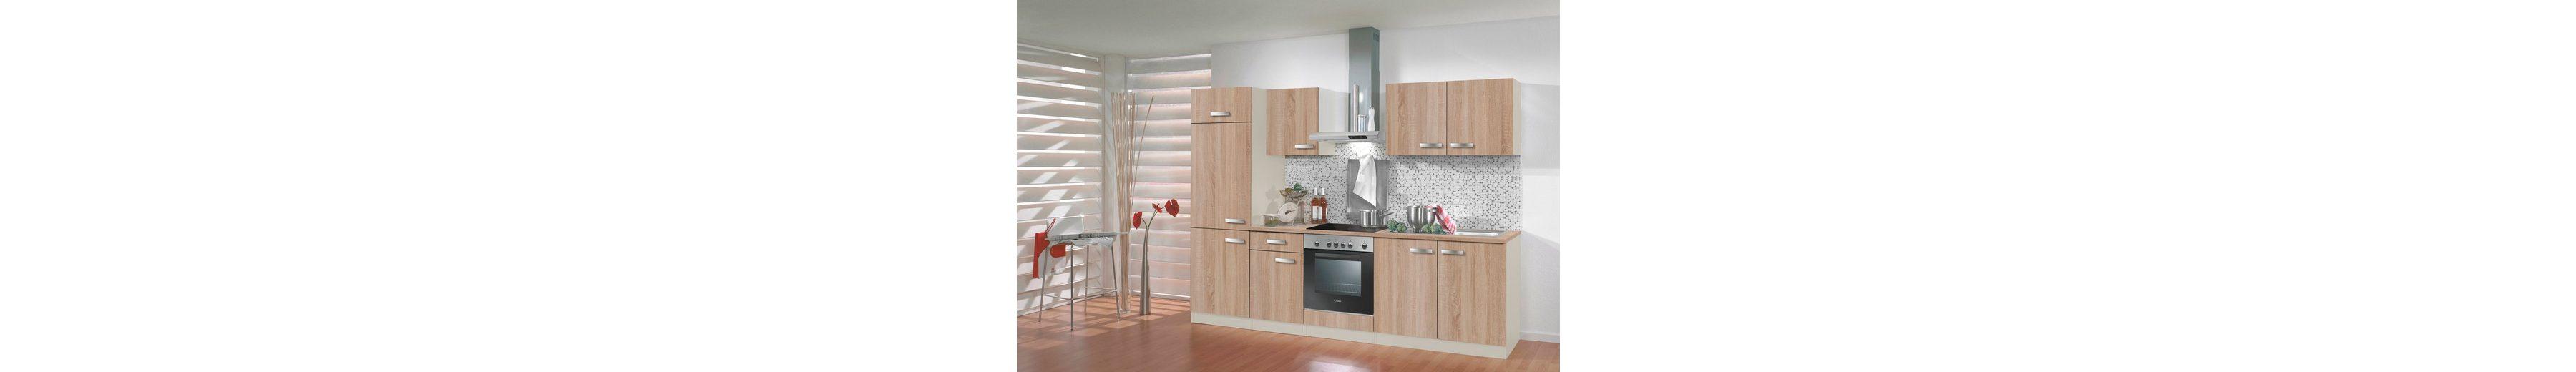 Küchenzeile ohne E-Geräte »Padua«, Breite 270 cm